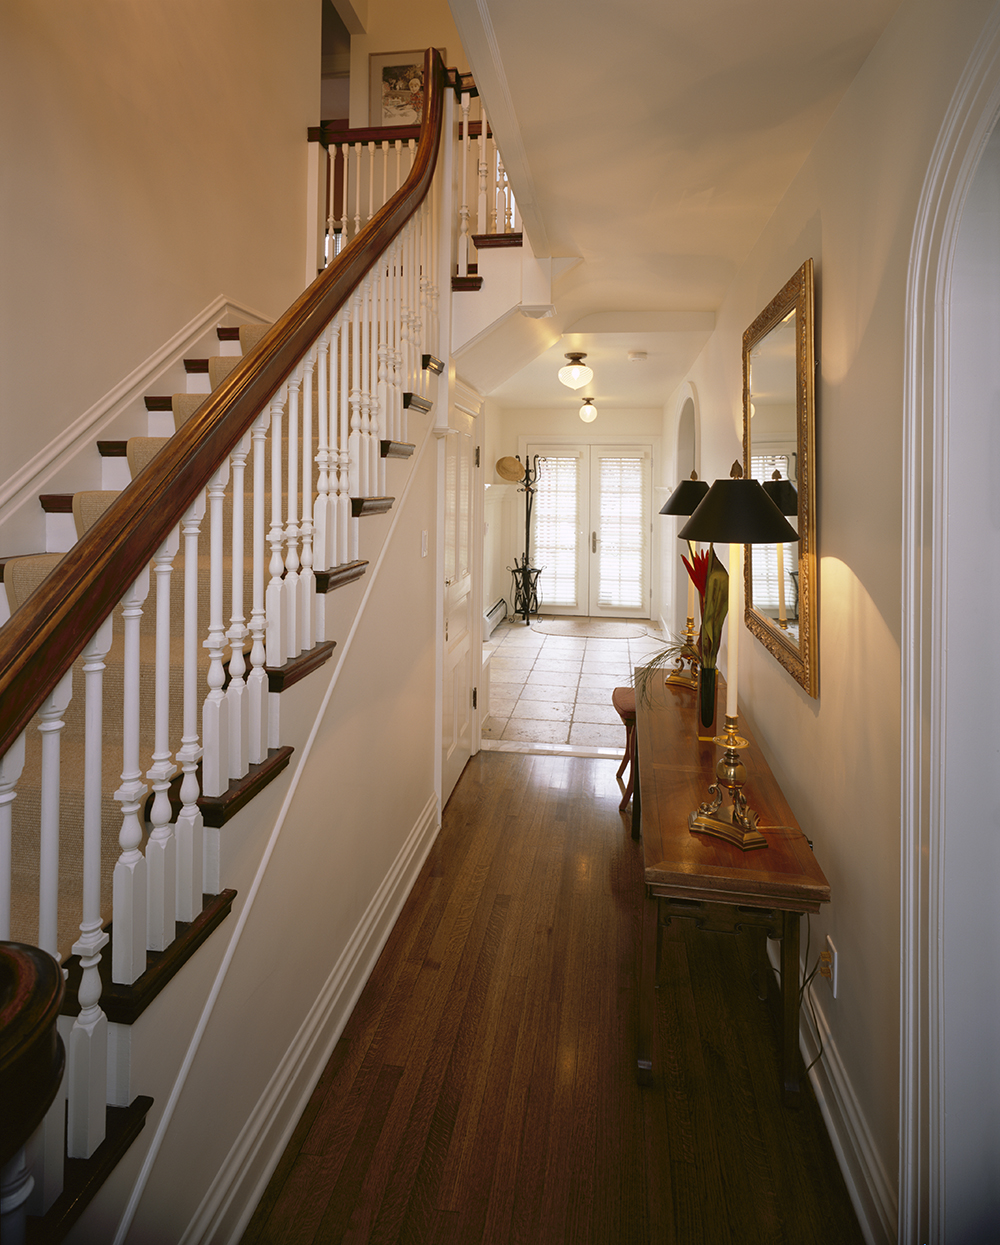 Colonial_Revival_Cheesman_Hallway_002small.jpg